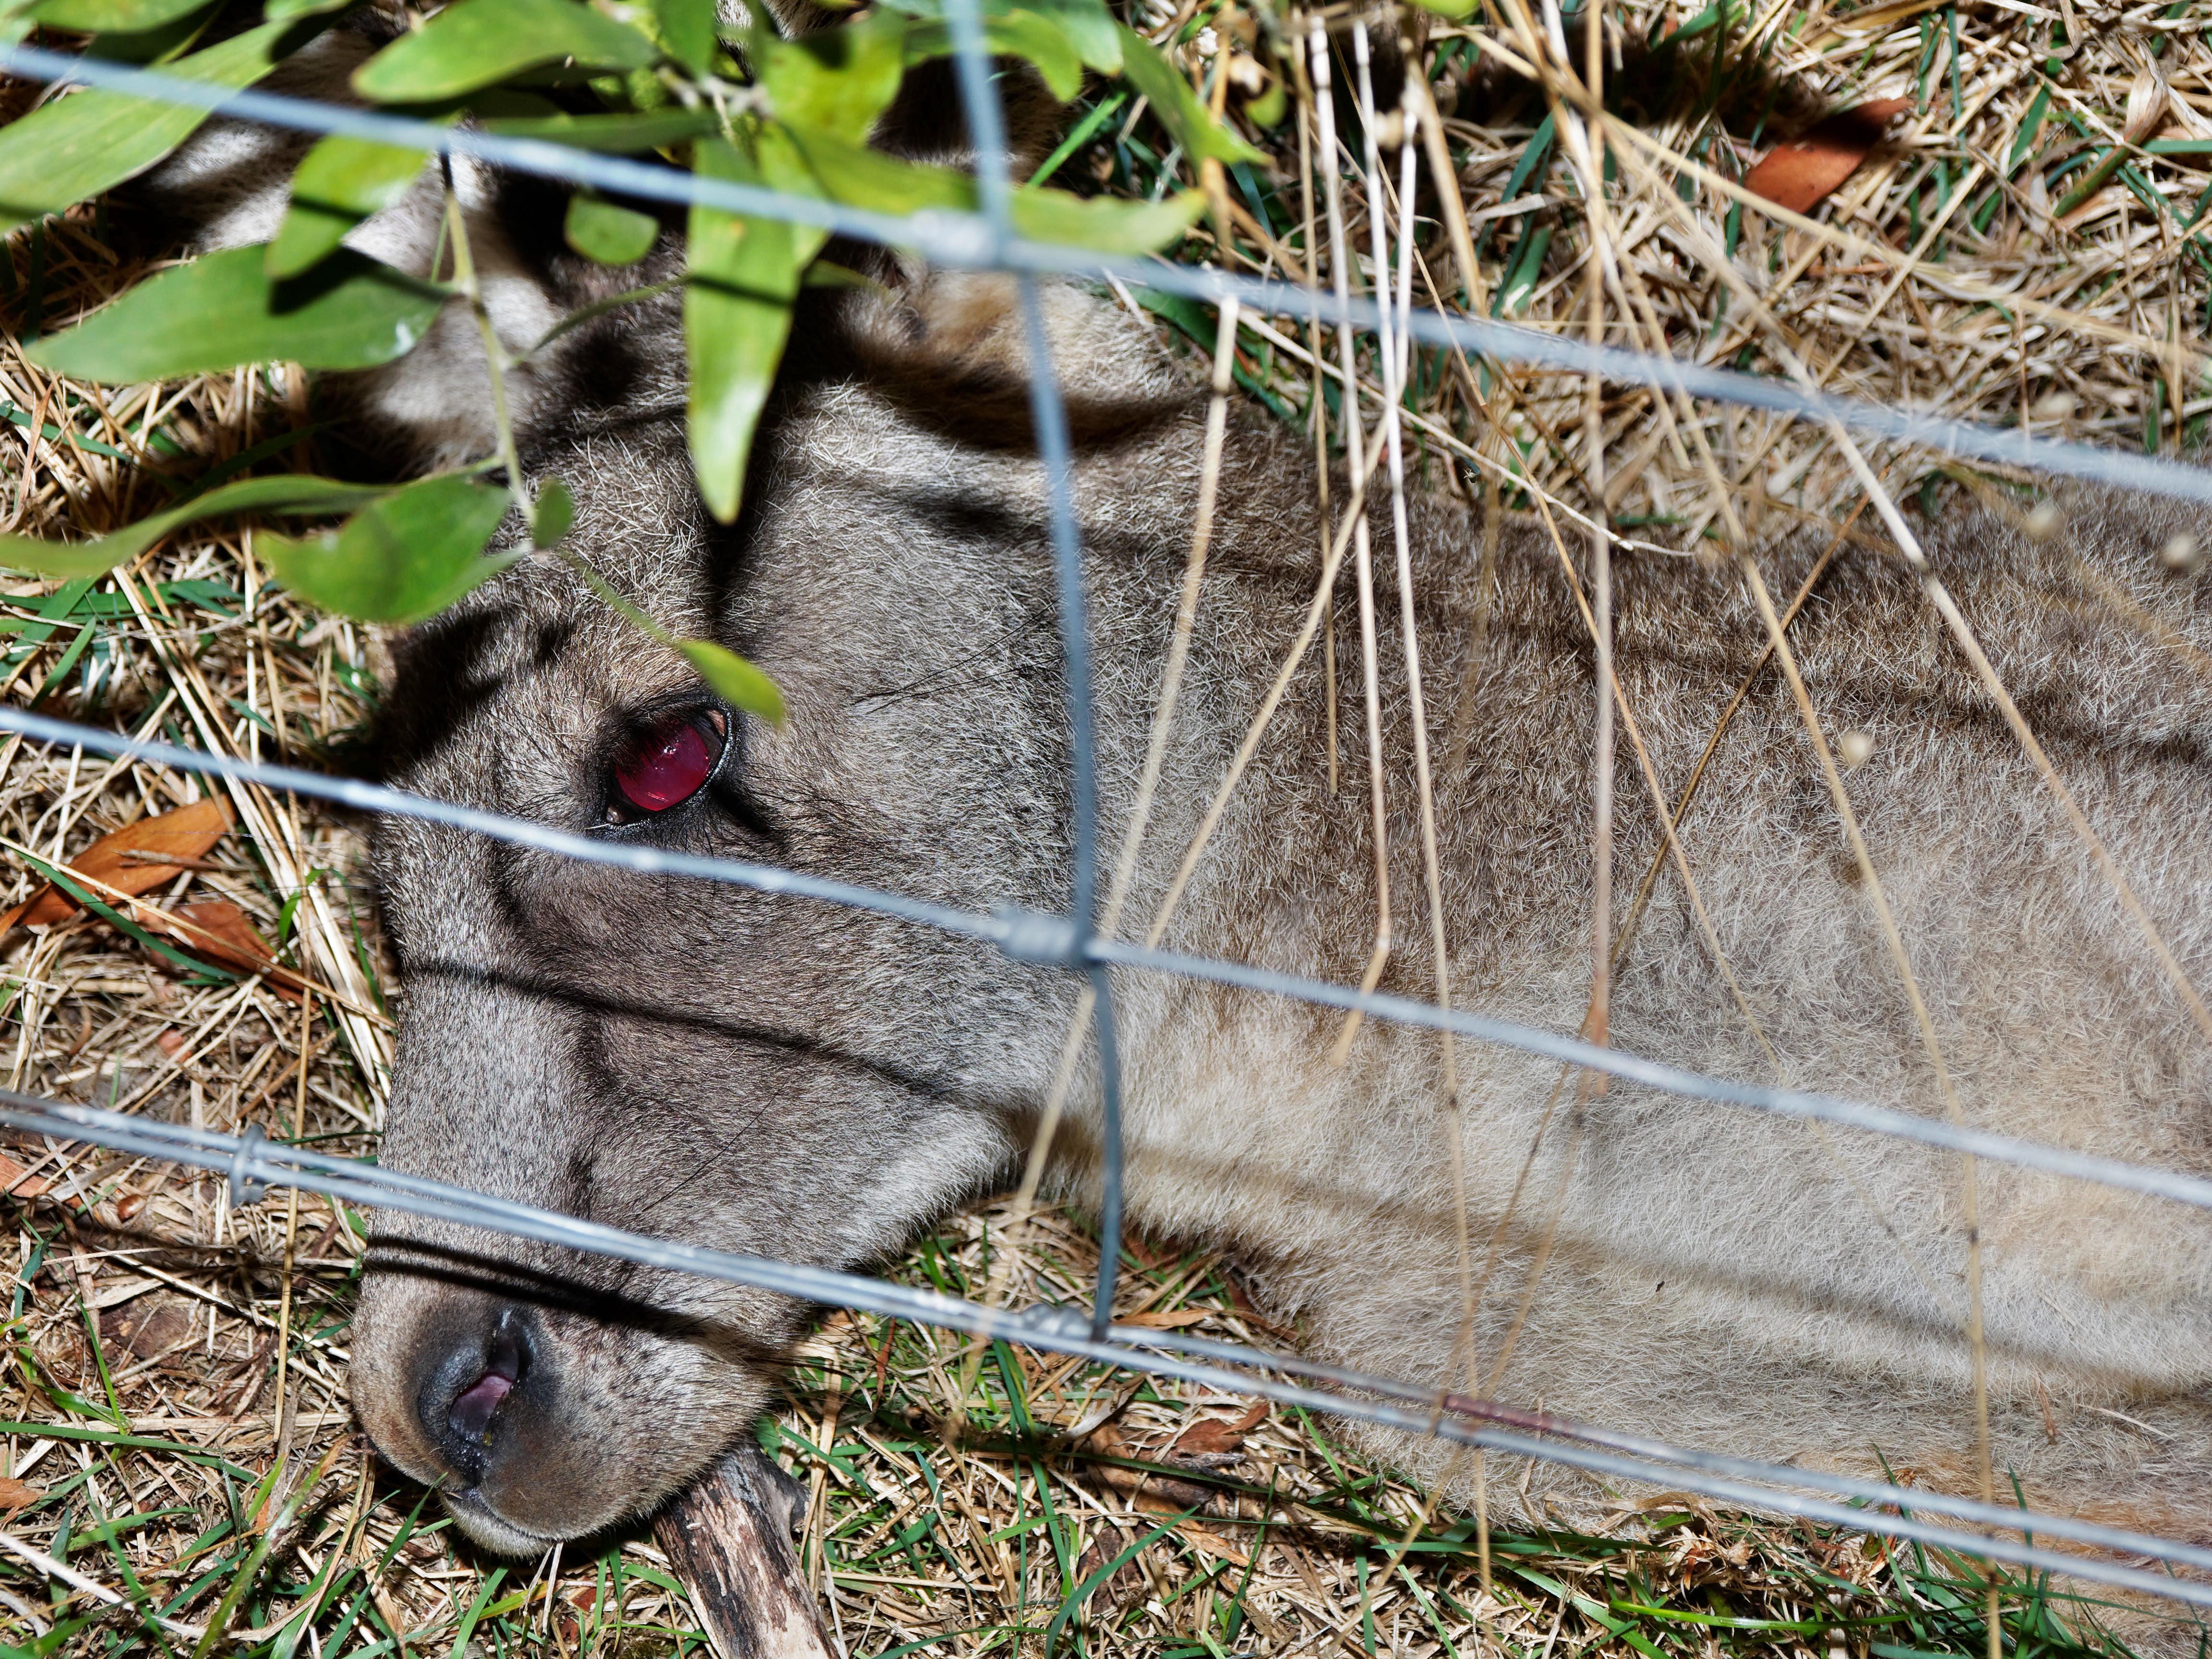 Kangaroo-5.jpeg